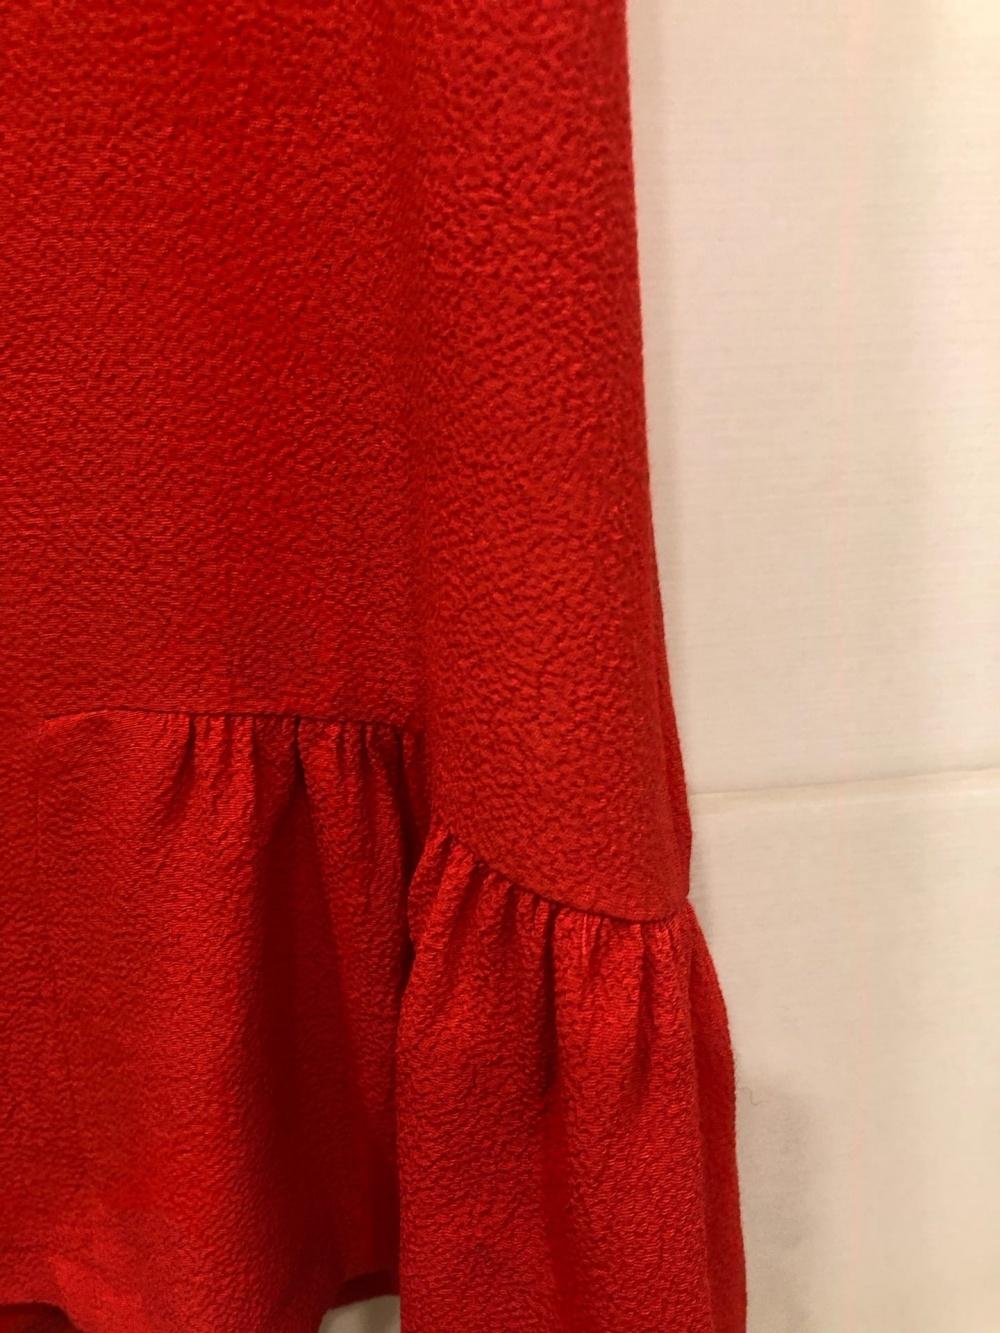 Блузка SANDRO PARIS.Размер 1.